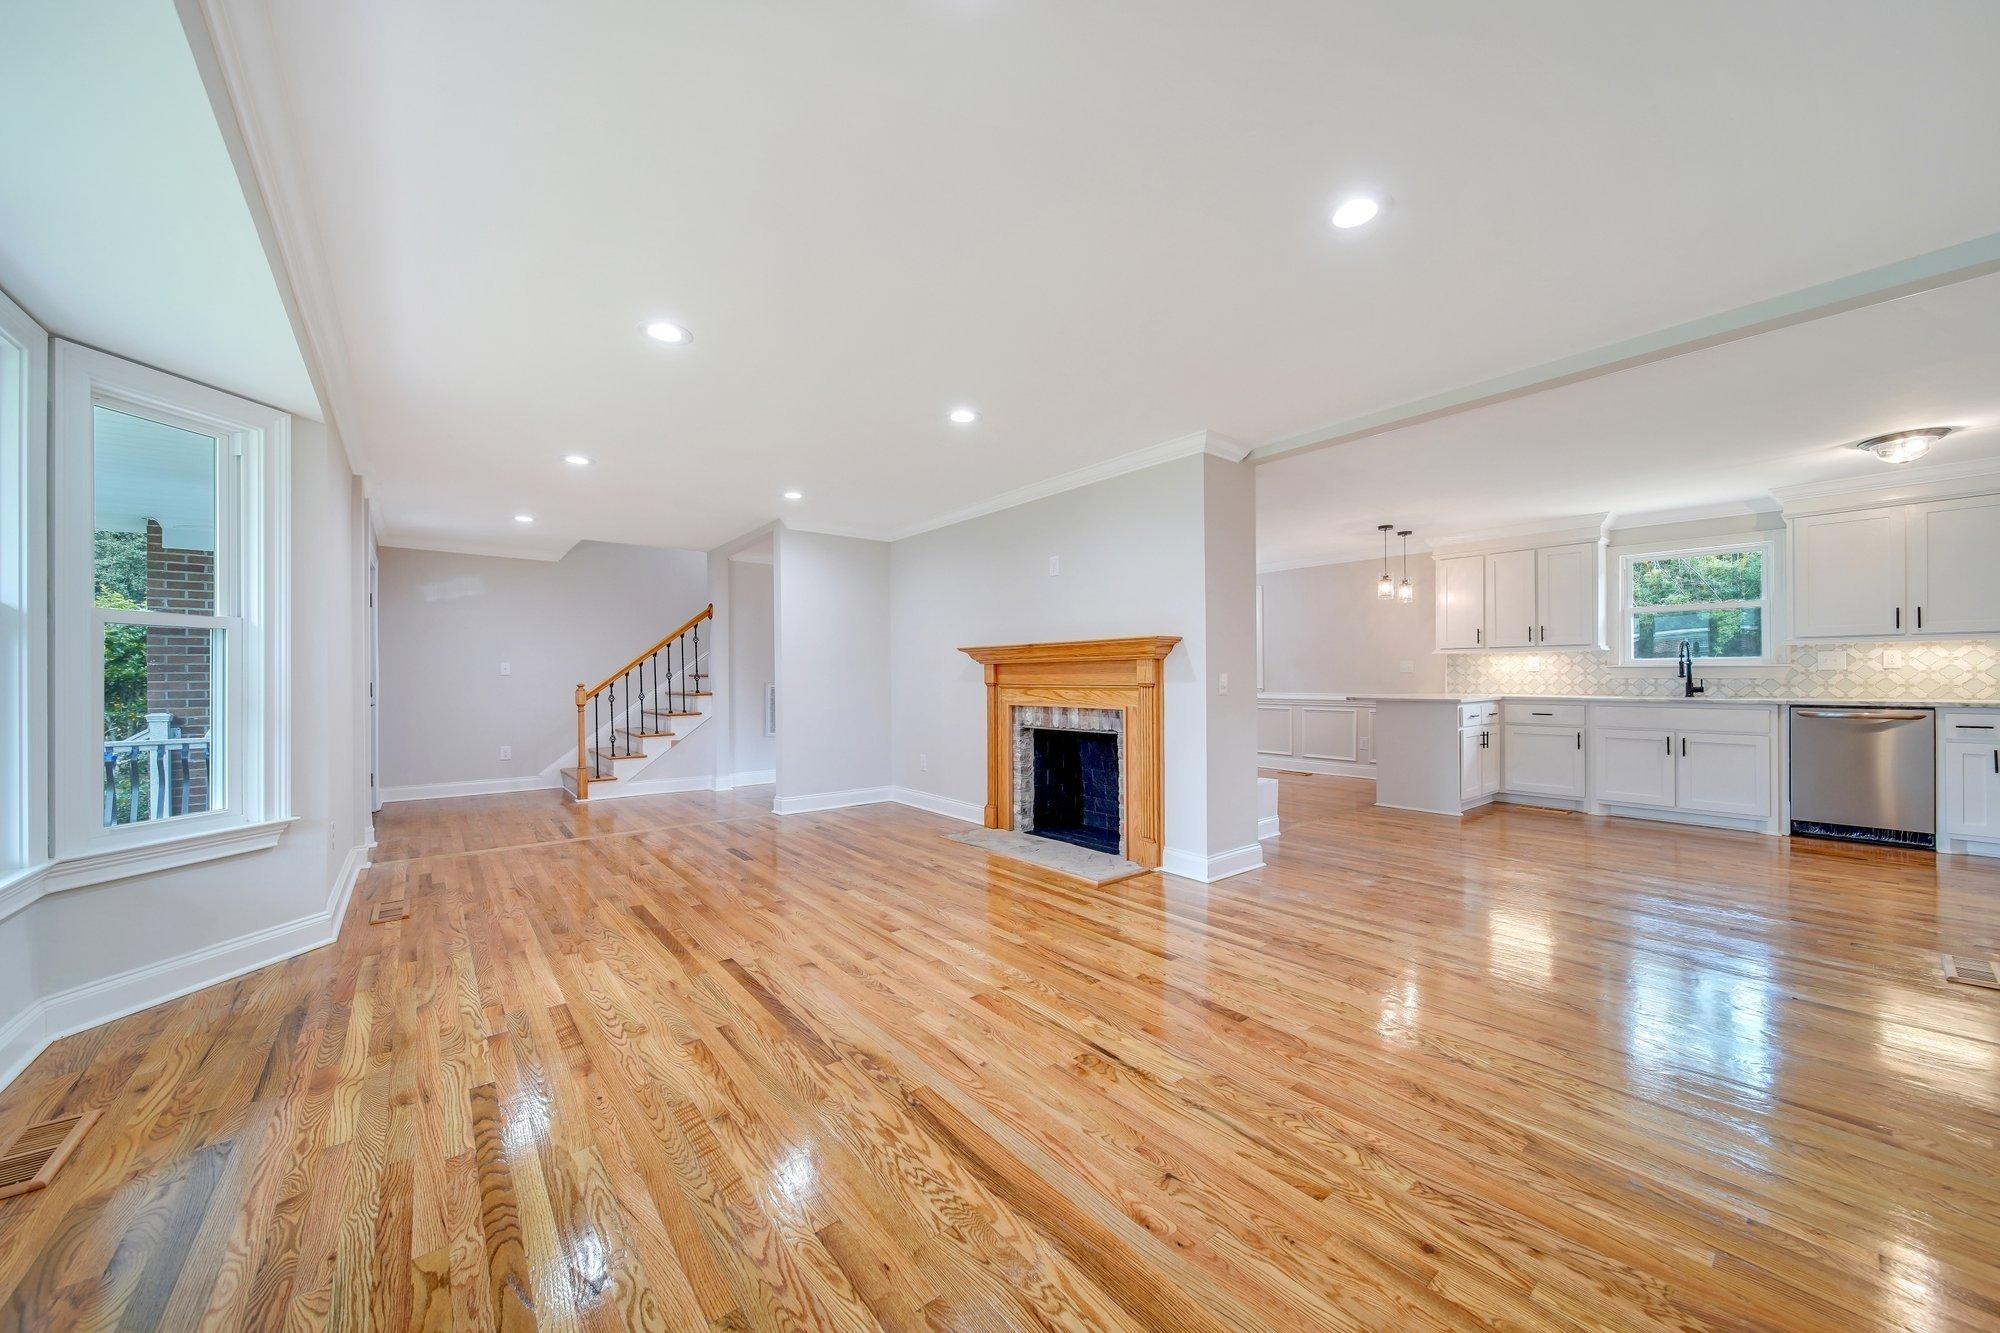 Country Club II Homes For Sale - 1477 Burningtree, Charleston, SC - 36